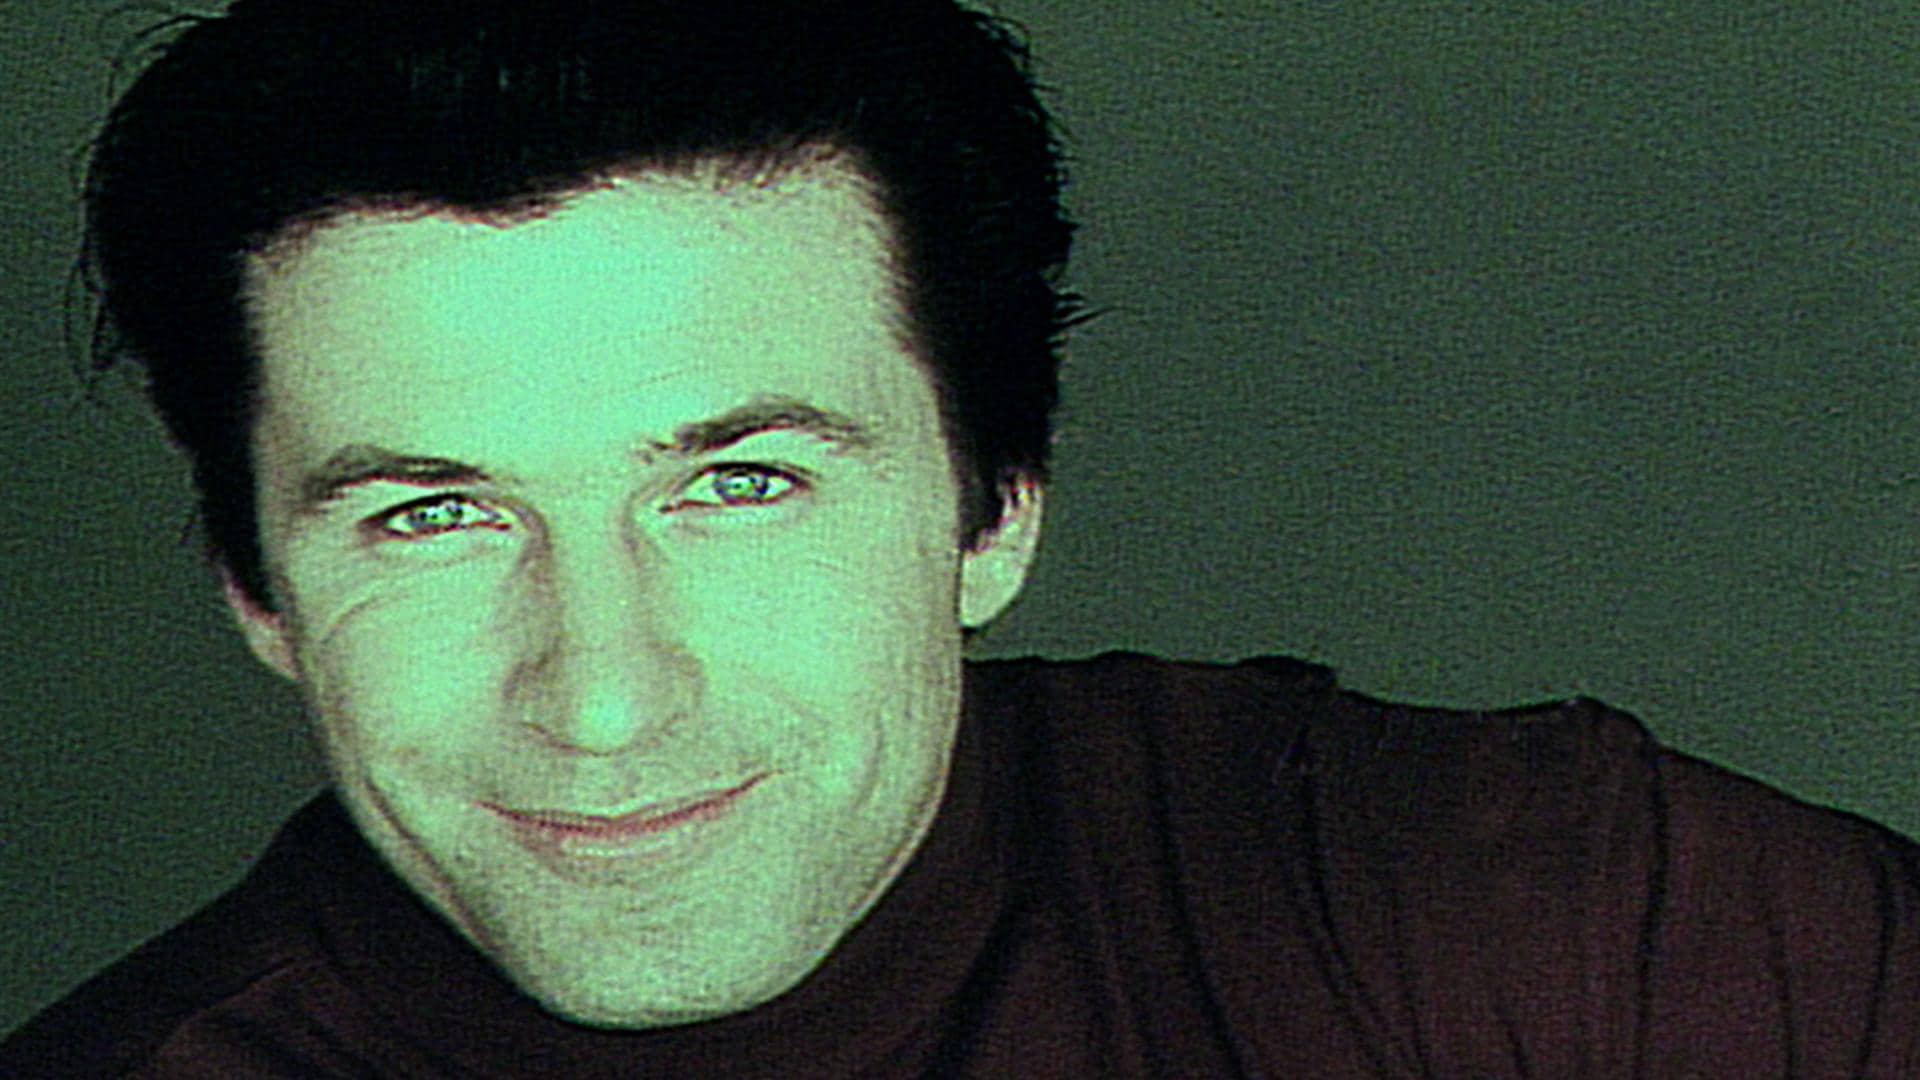 Alec Baldwin: February 23, 1991